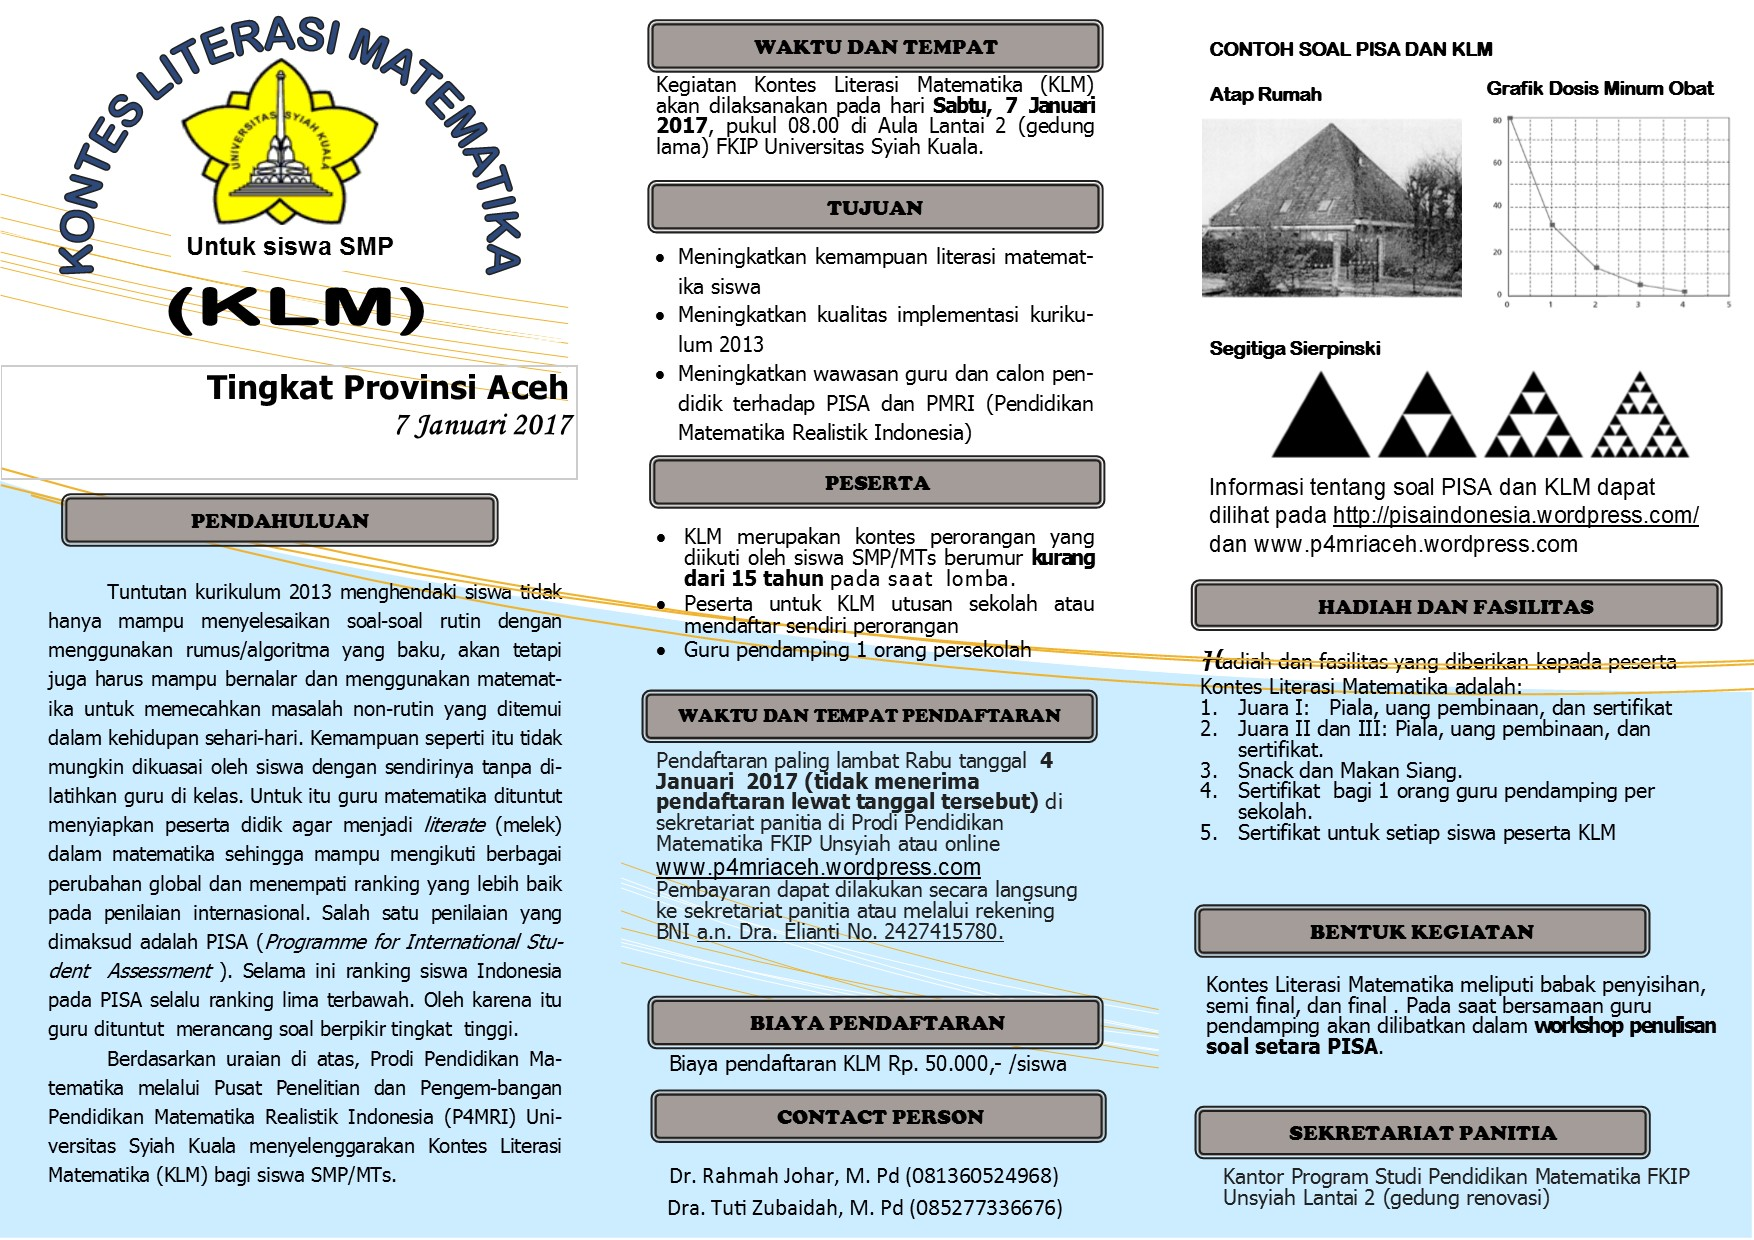 leaflet-klm-2016-di-unsyiah